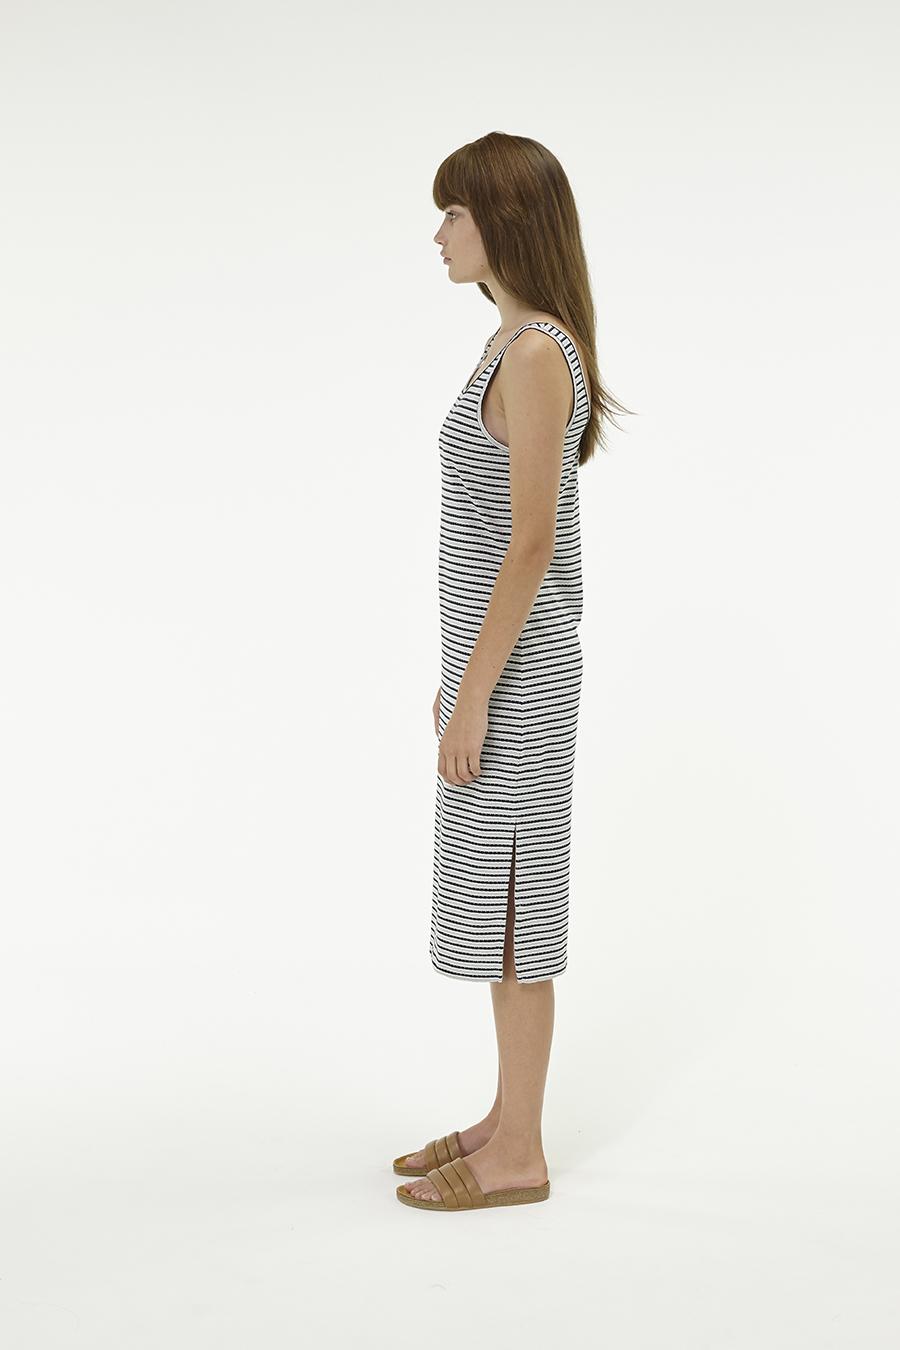 Huffer_Q3-16_W-Railway-Plaza-Dress_Black-Grey-02